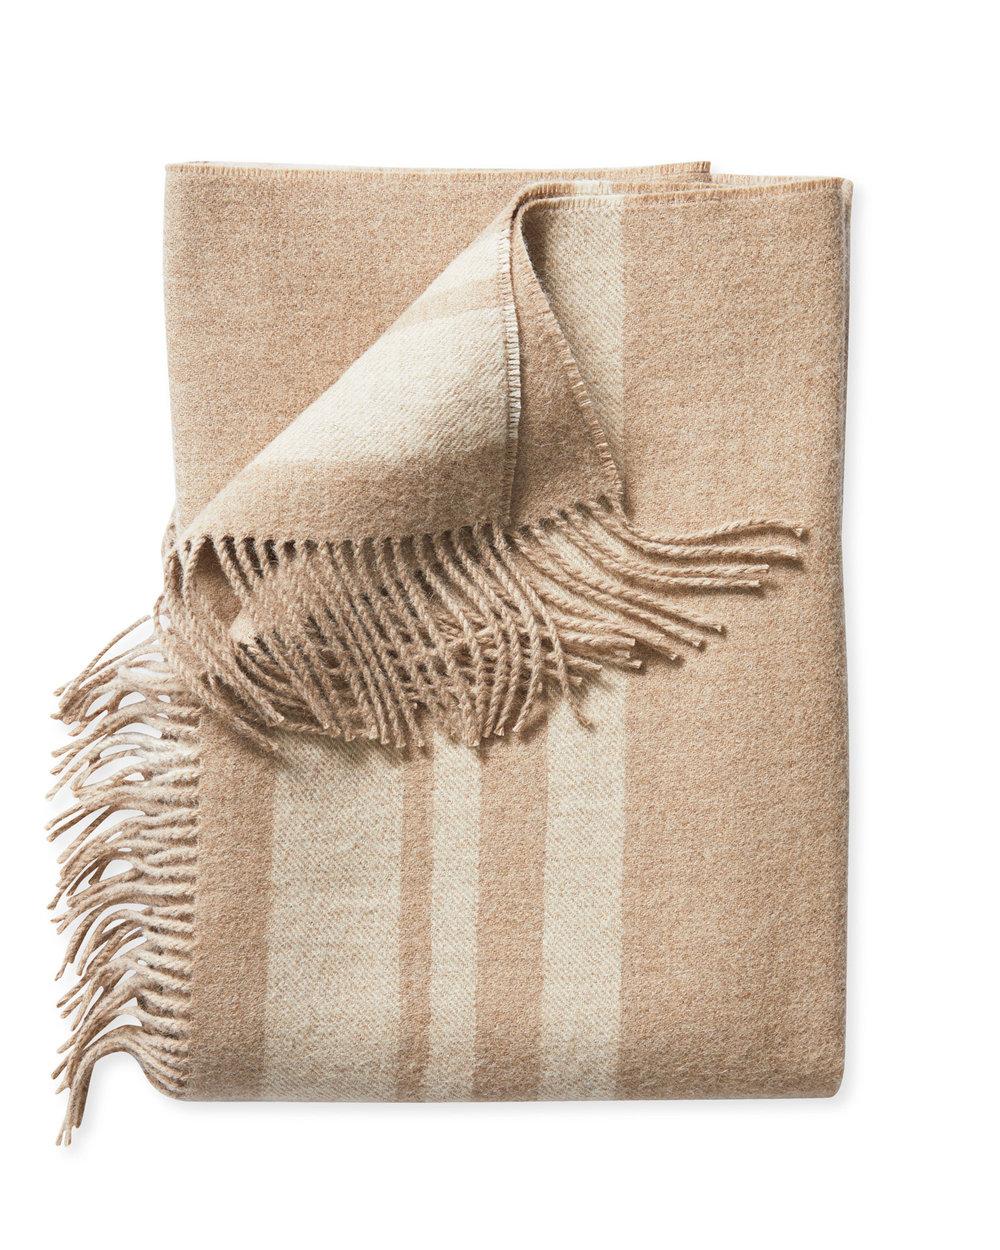 Throw_Blanket_Avery_Oatmeal_Ivory_Fold_MV_1250_Crop_SH.jpg